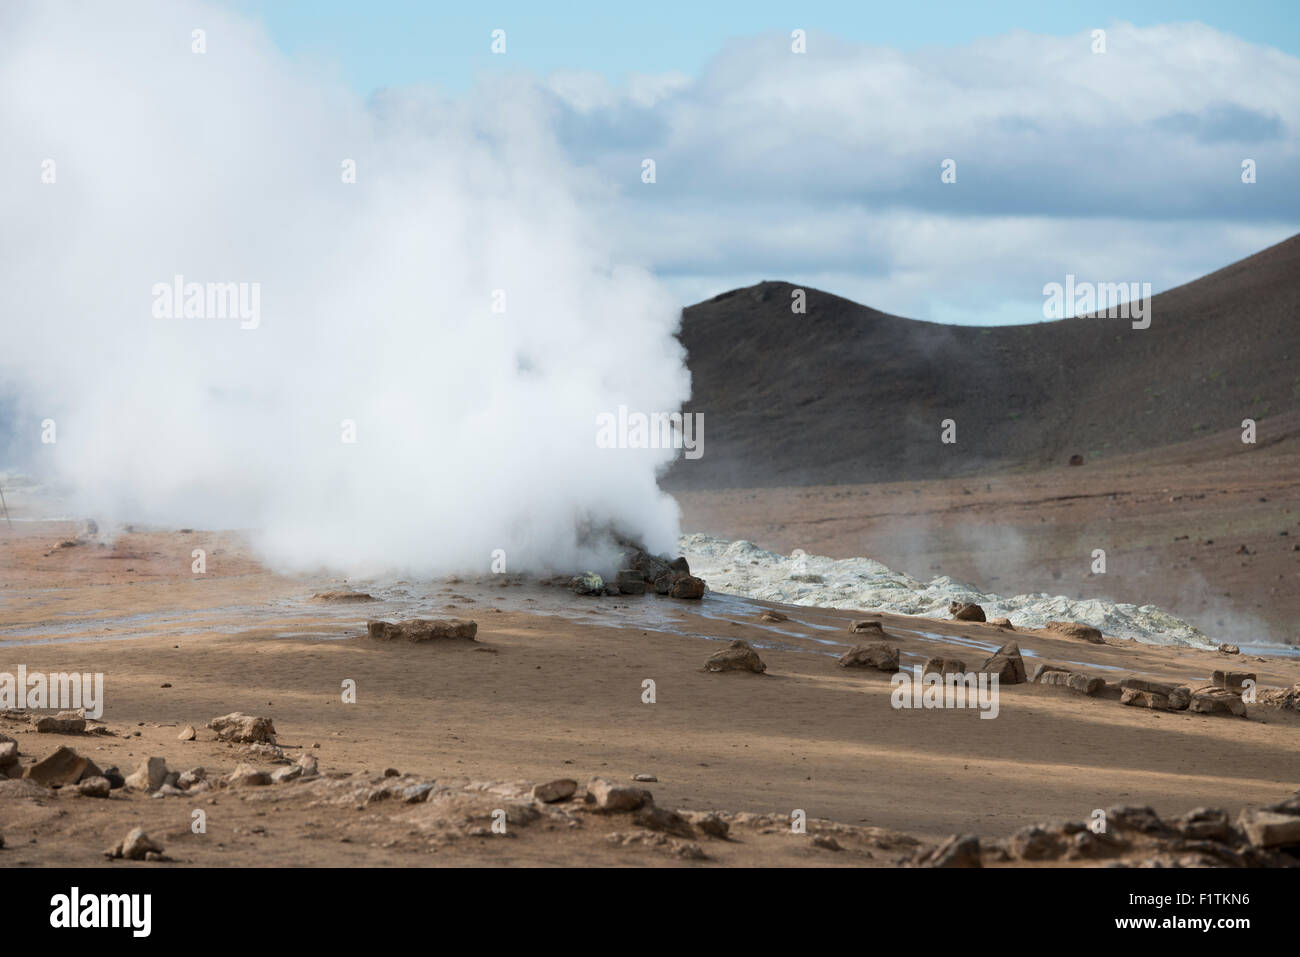 Iceland, Northeast Iceland, Namaskard. Namafjall (aka Hverir) geothermal fields. Active steaming fumaroles. - Stock Image